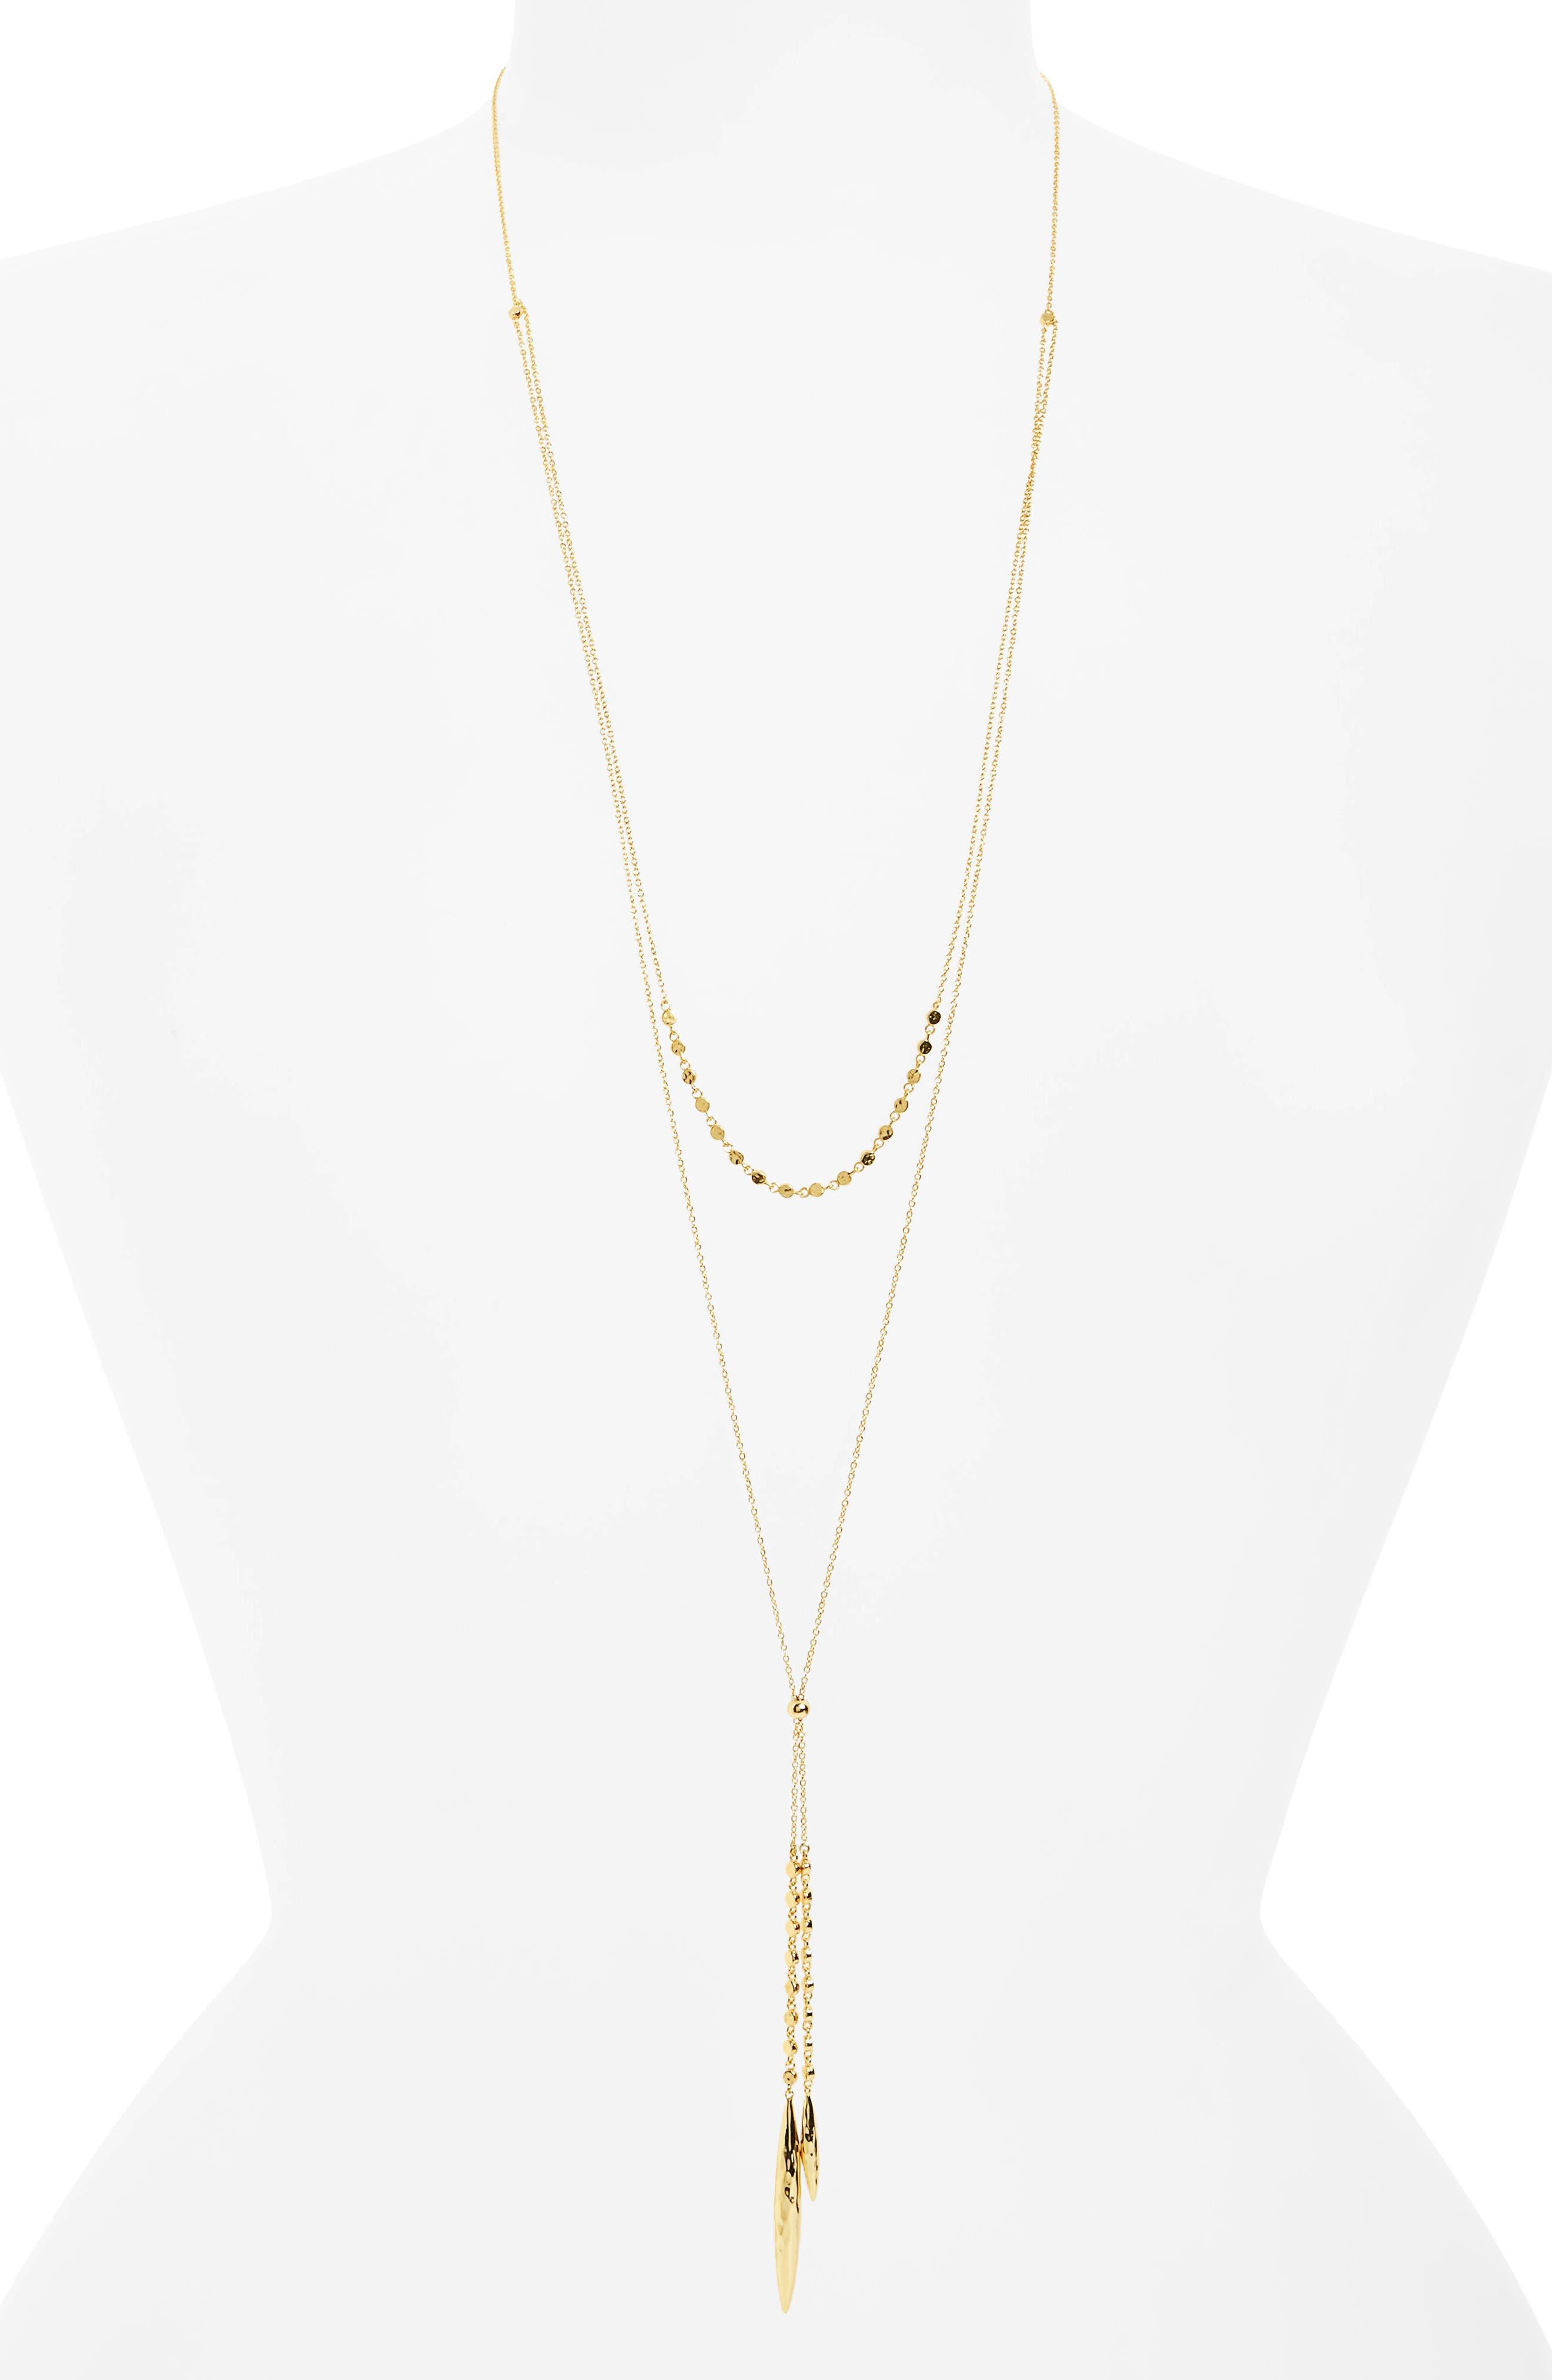 GORJANA Chloe Multistrand Necklace